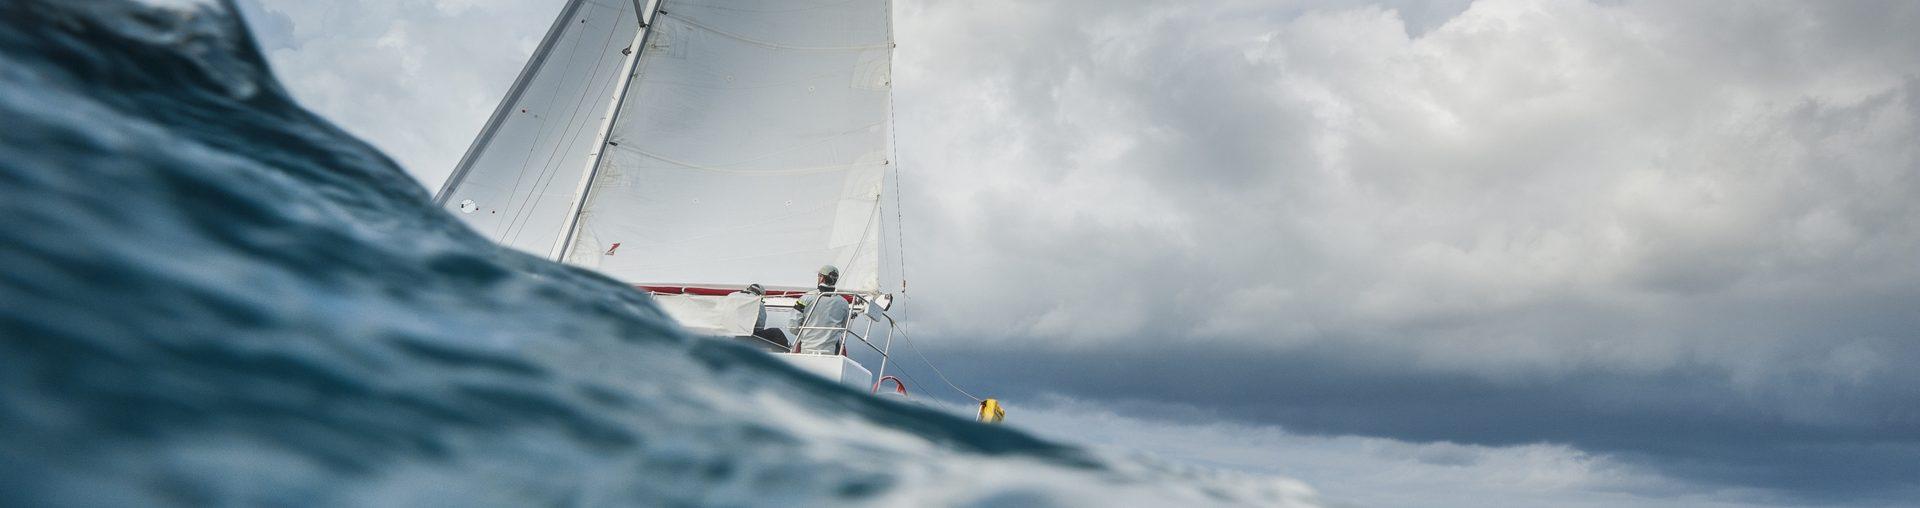 Sfaturi de leadership de la marinarii trecuți prin furtuna